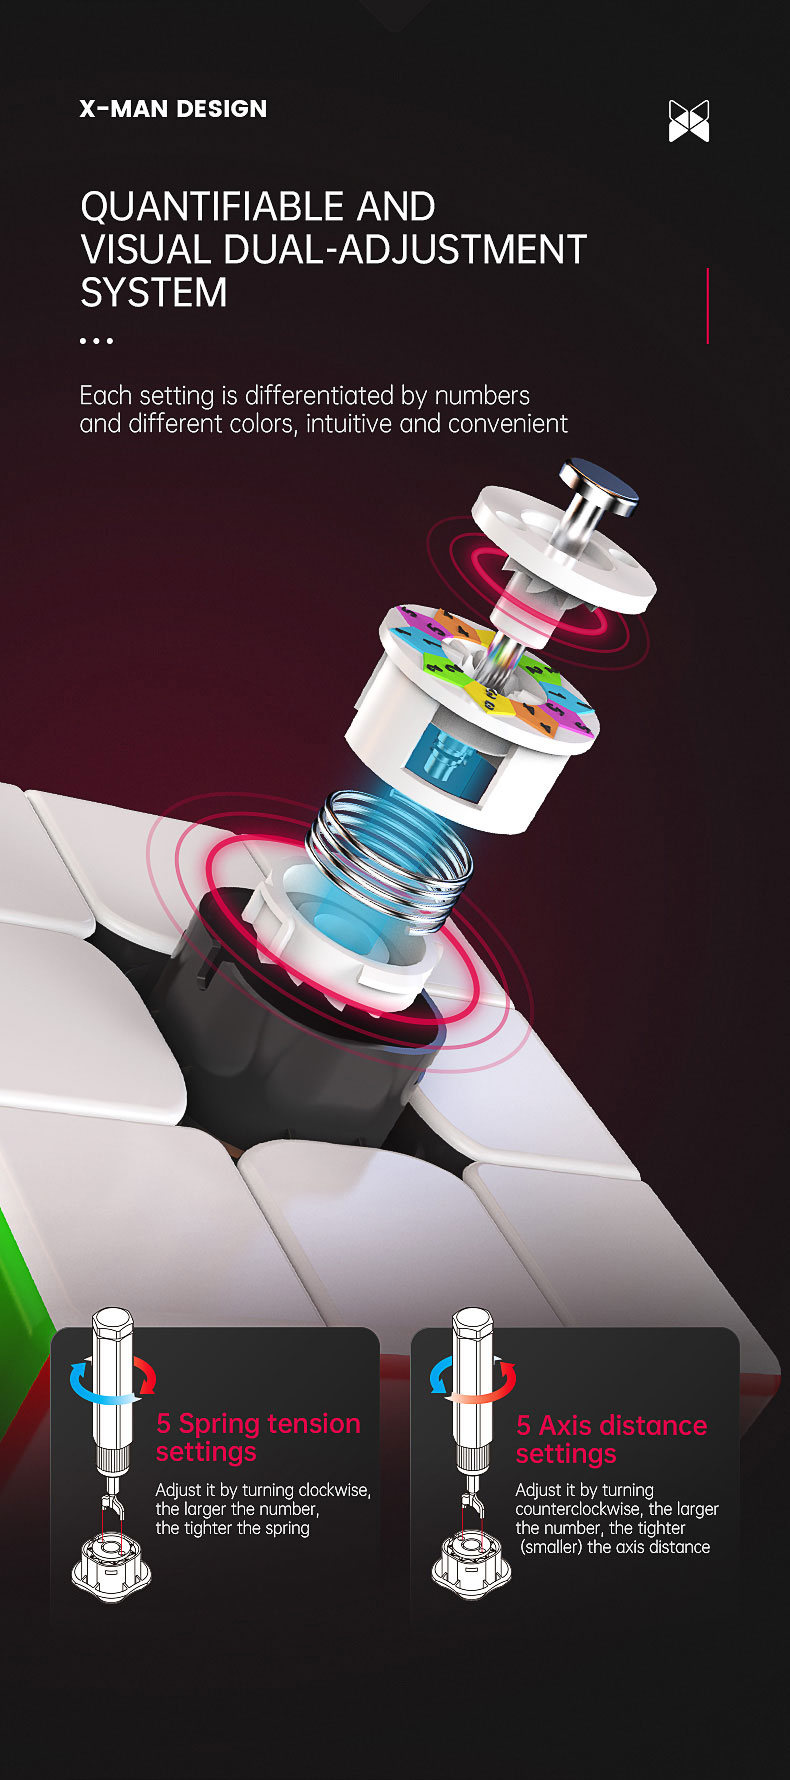 x-man-tornado-v2-dual-adjustment-system